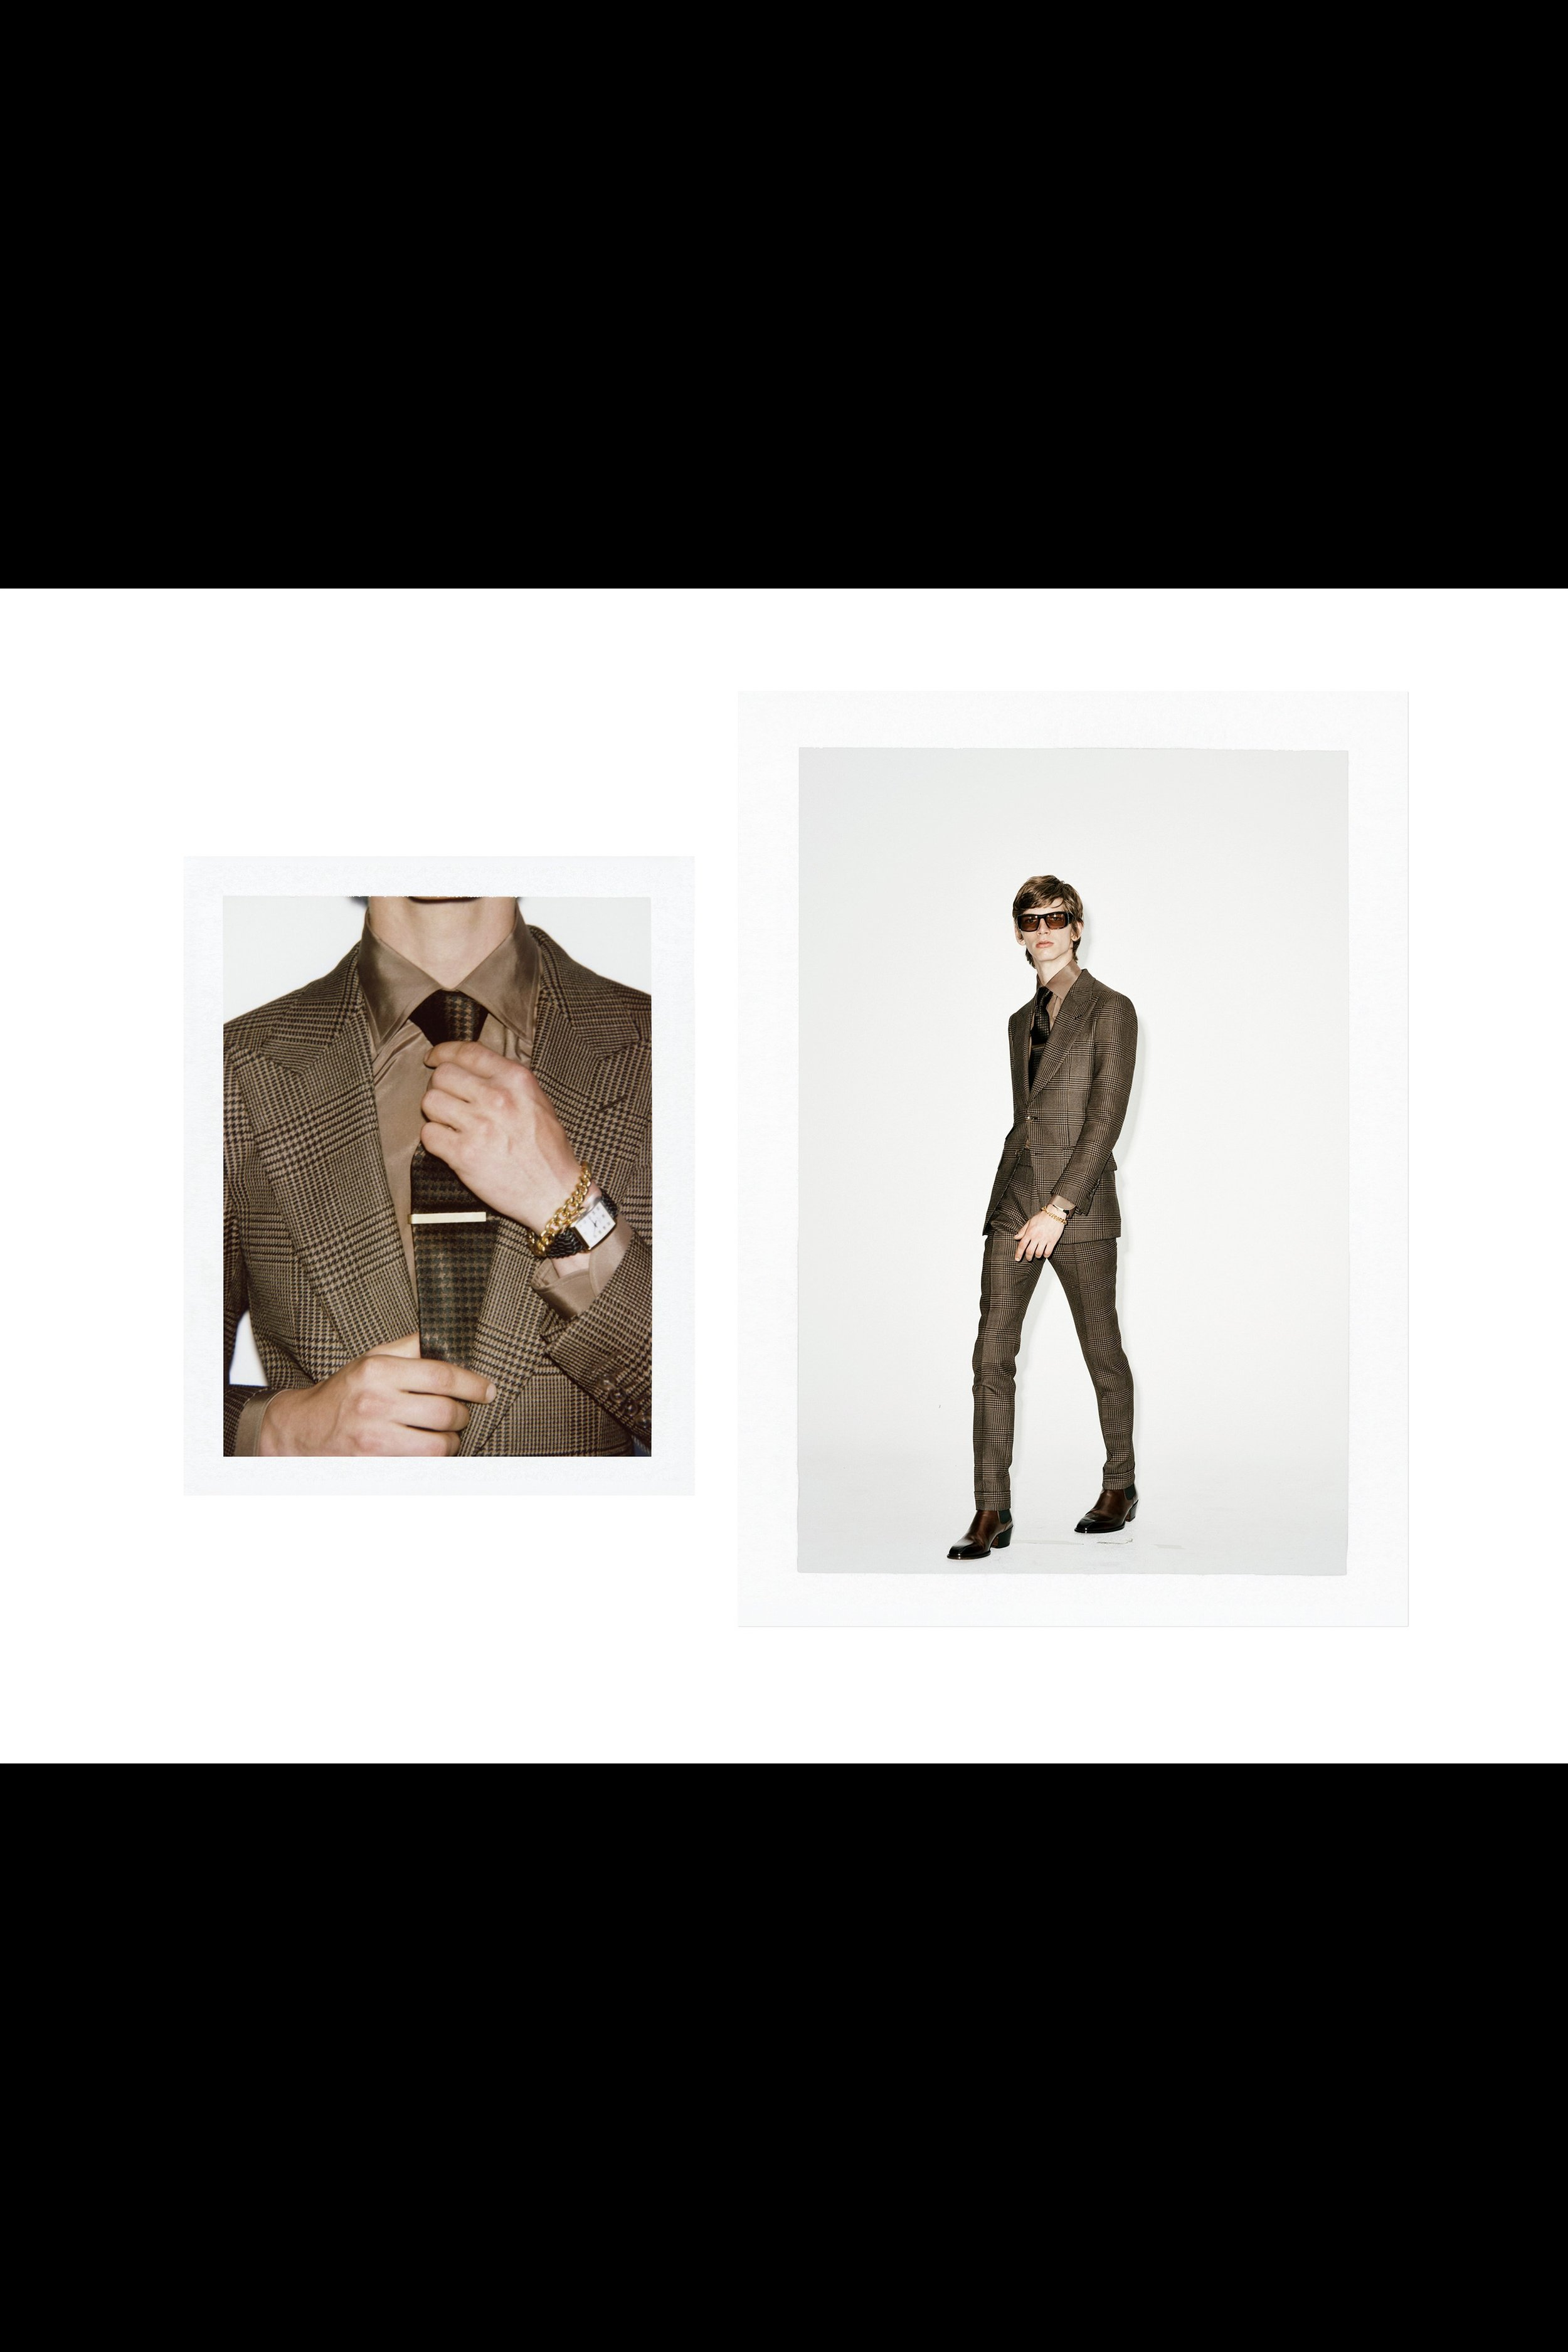 00022-Tom-Ford-vogue-menswear-spring-2019-pr.jpg